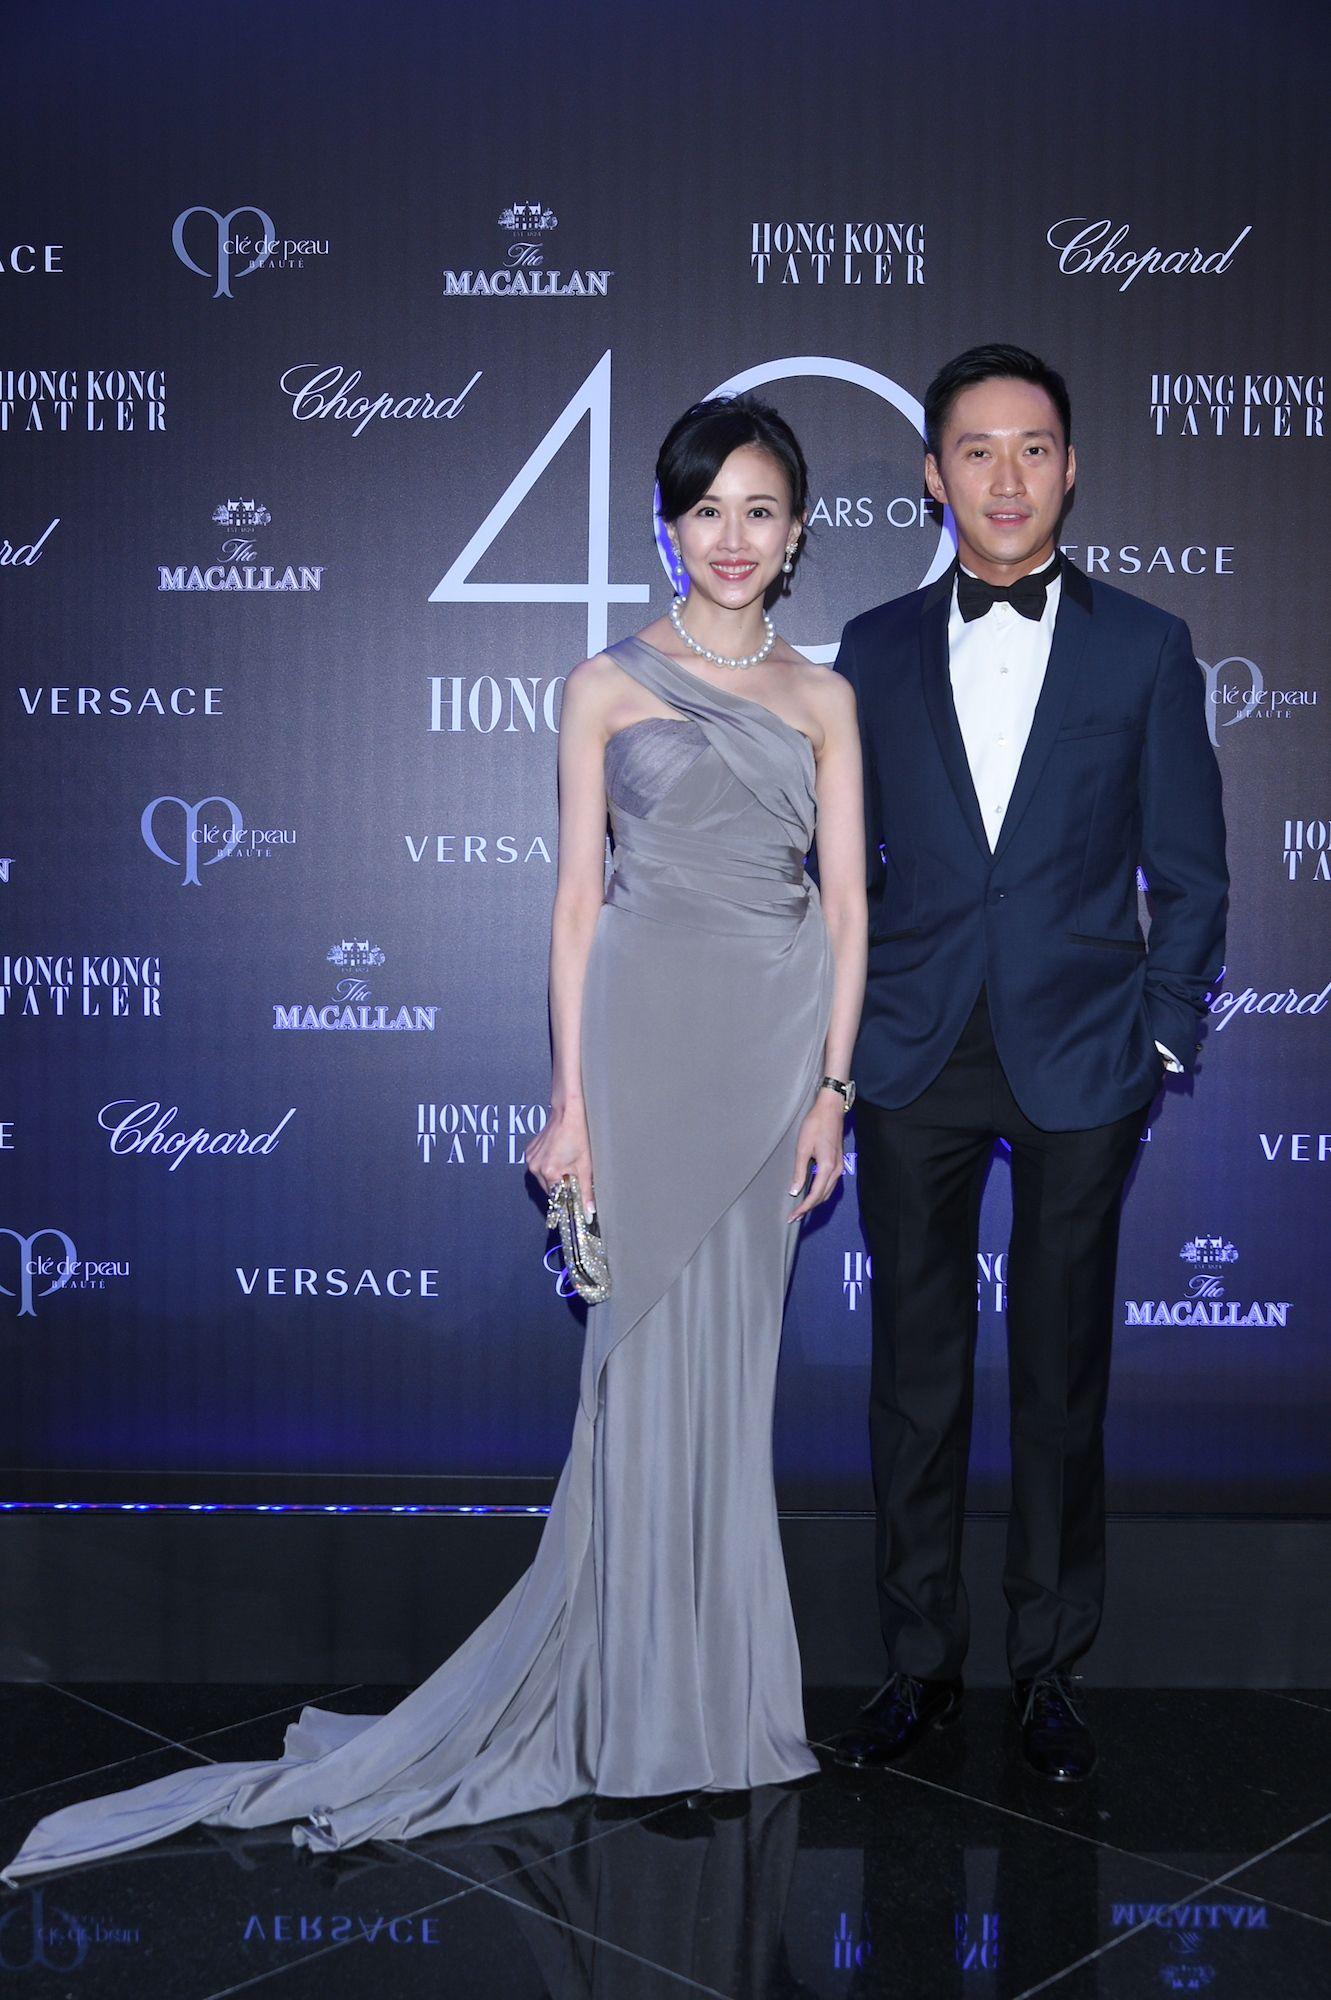 Jacqueline Chow, Evan Chow